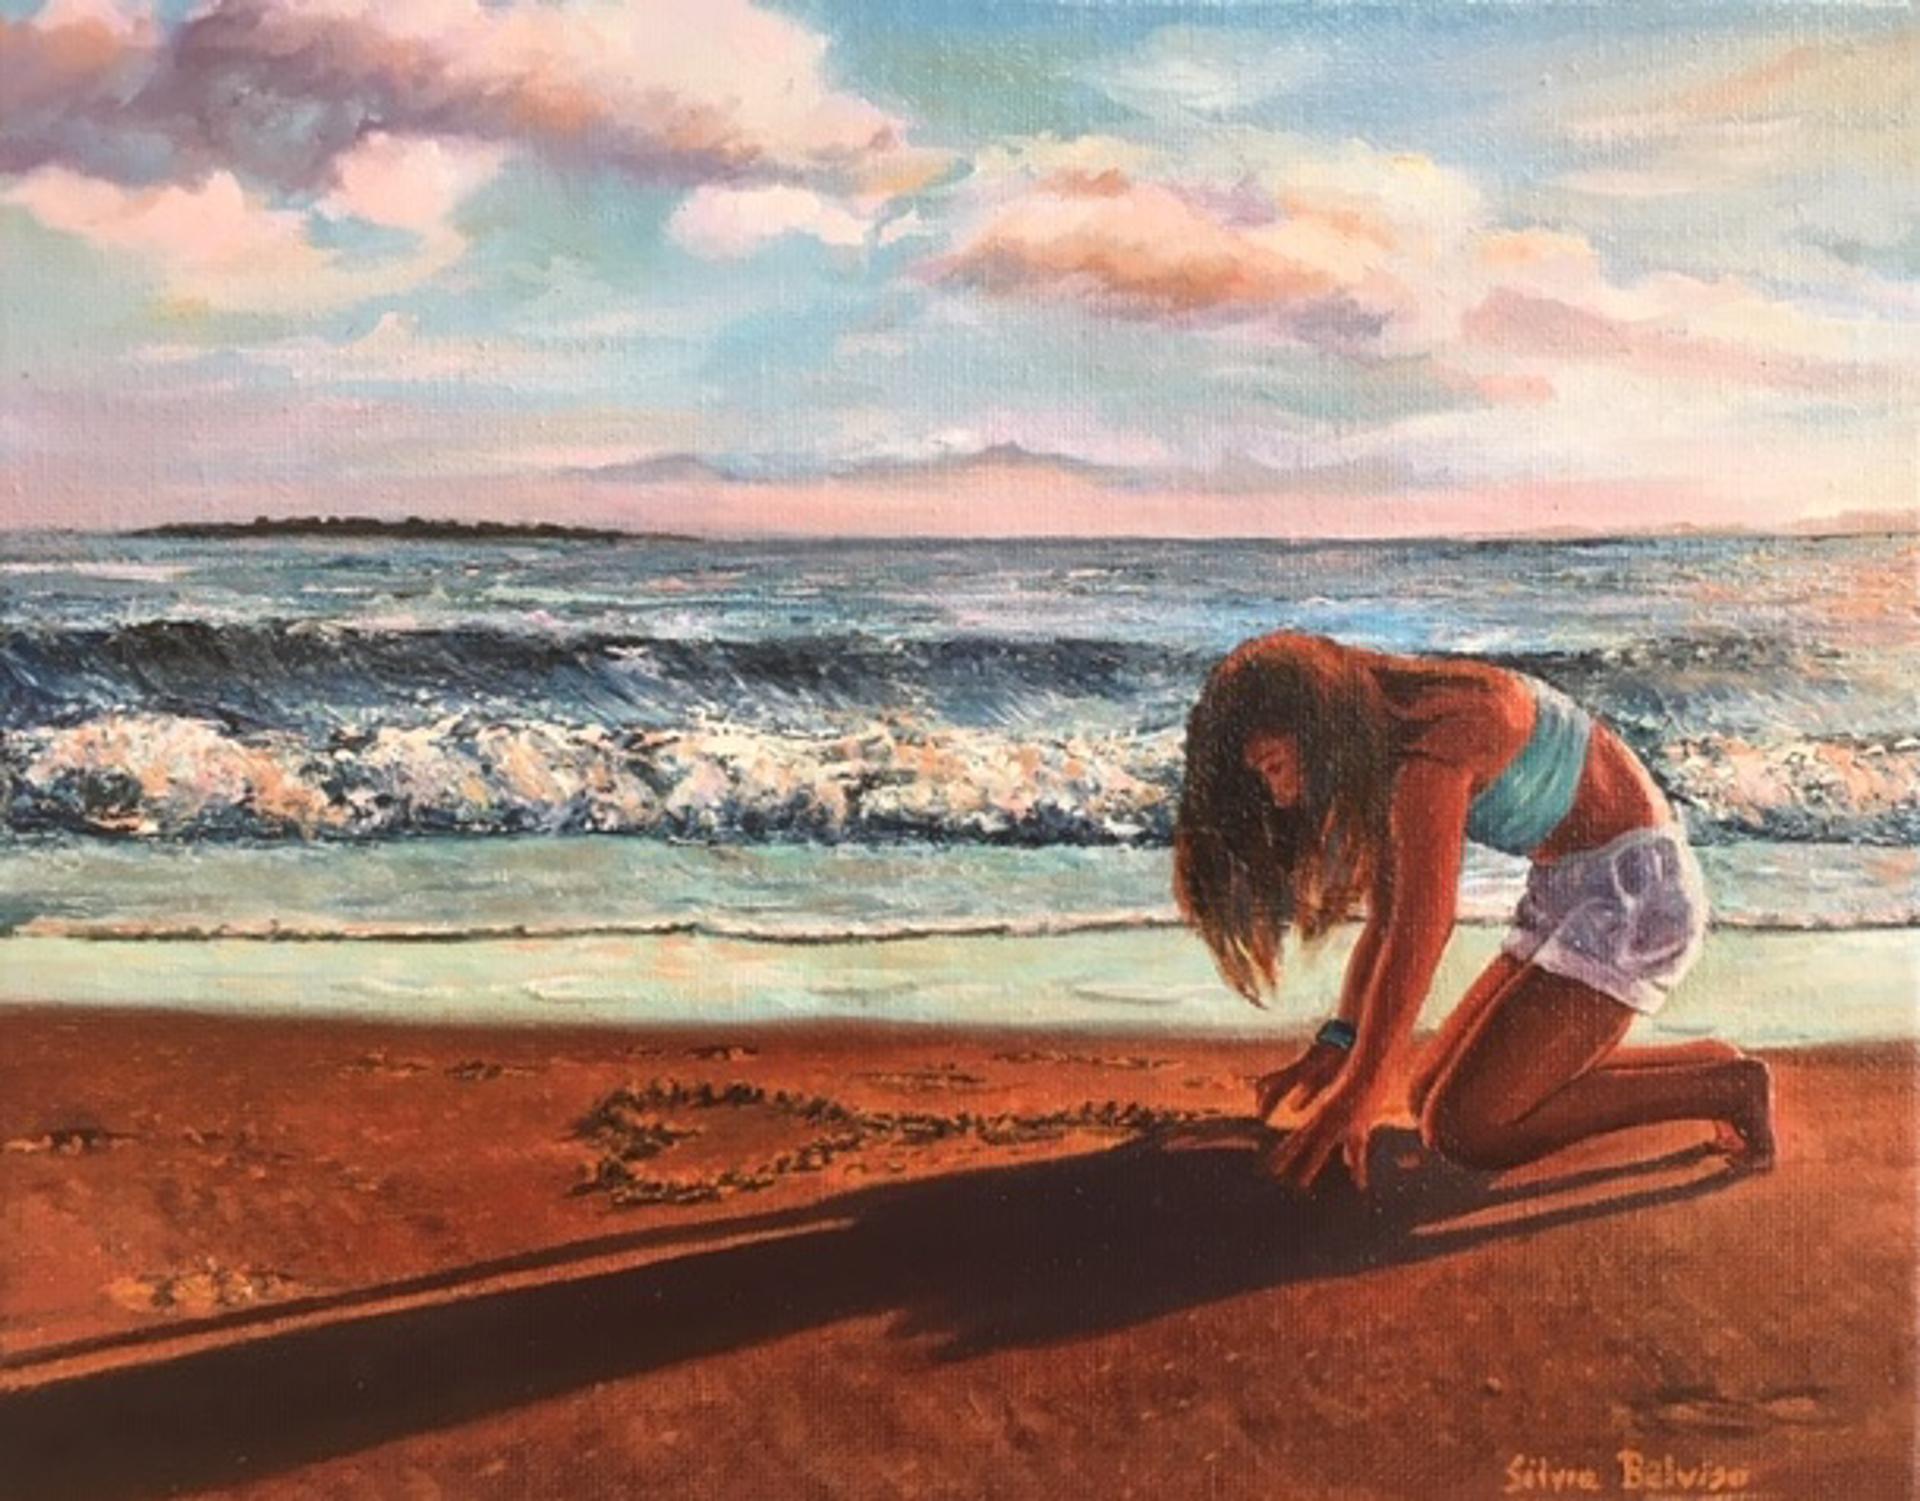 Heart of Summer by Silvia Belviso